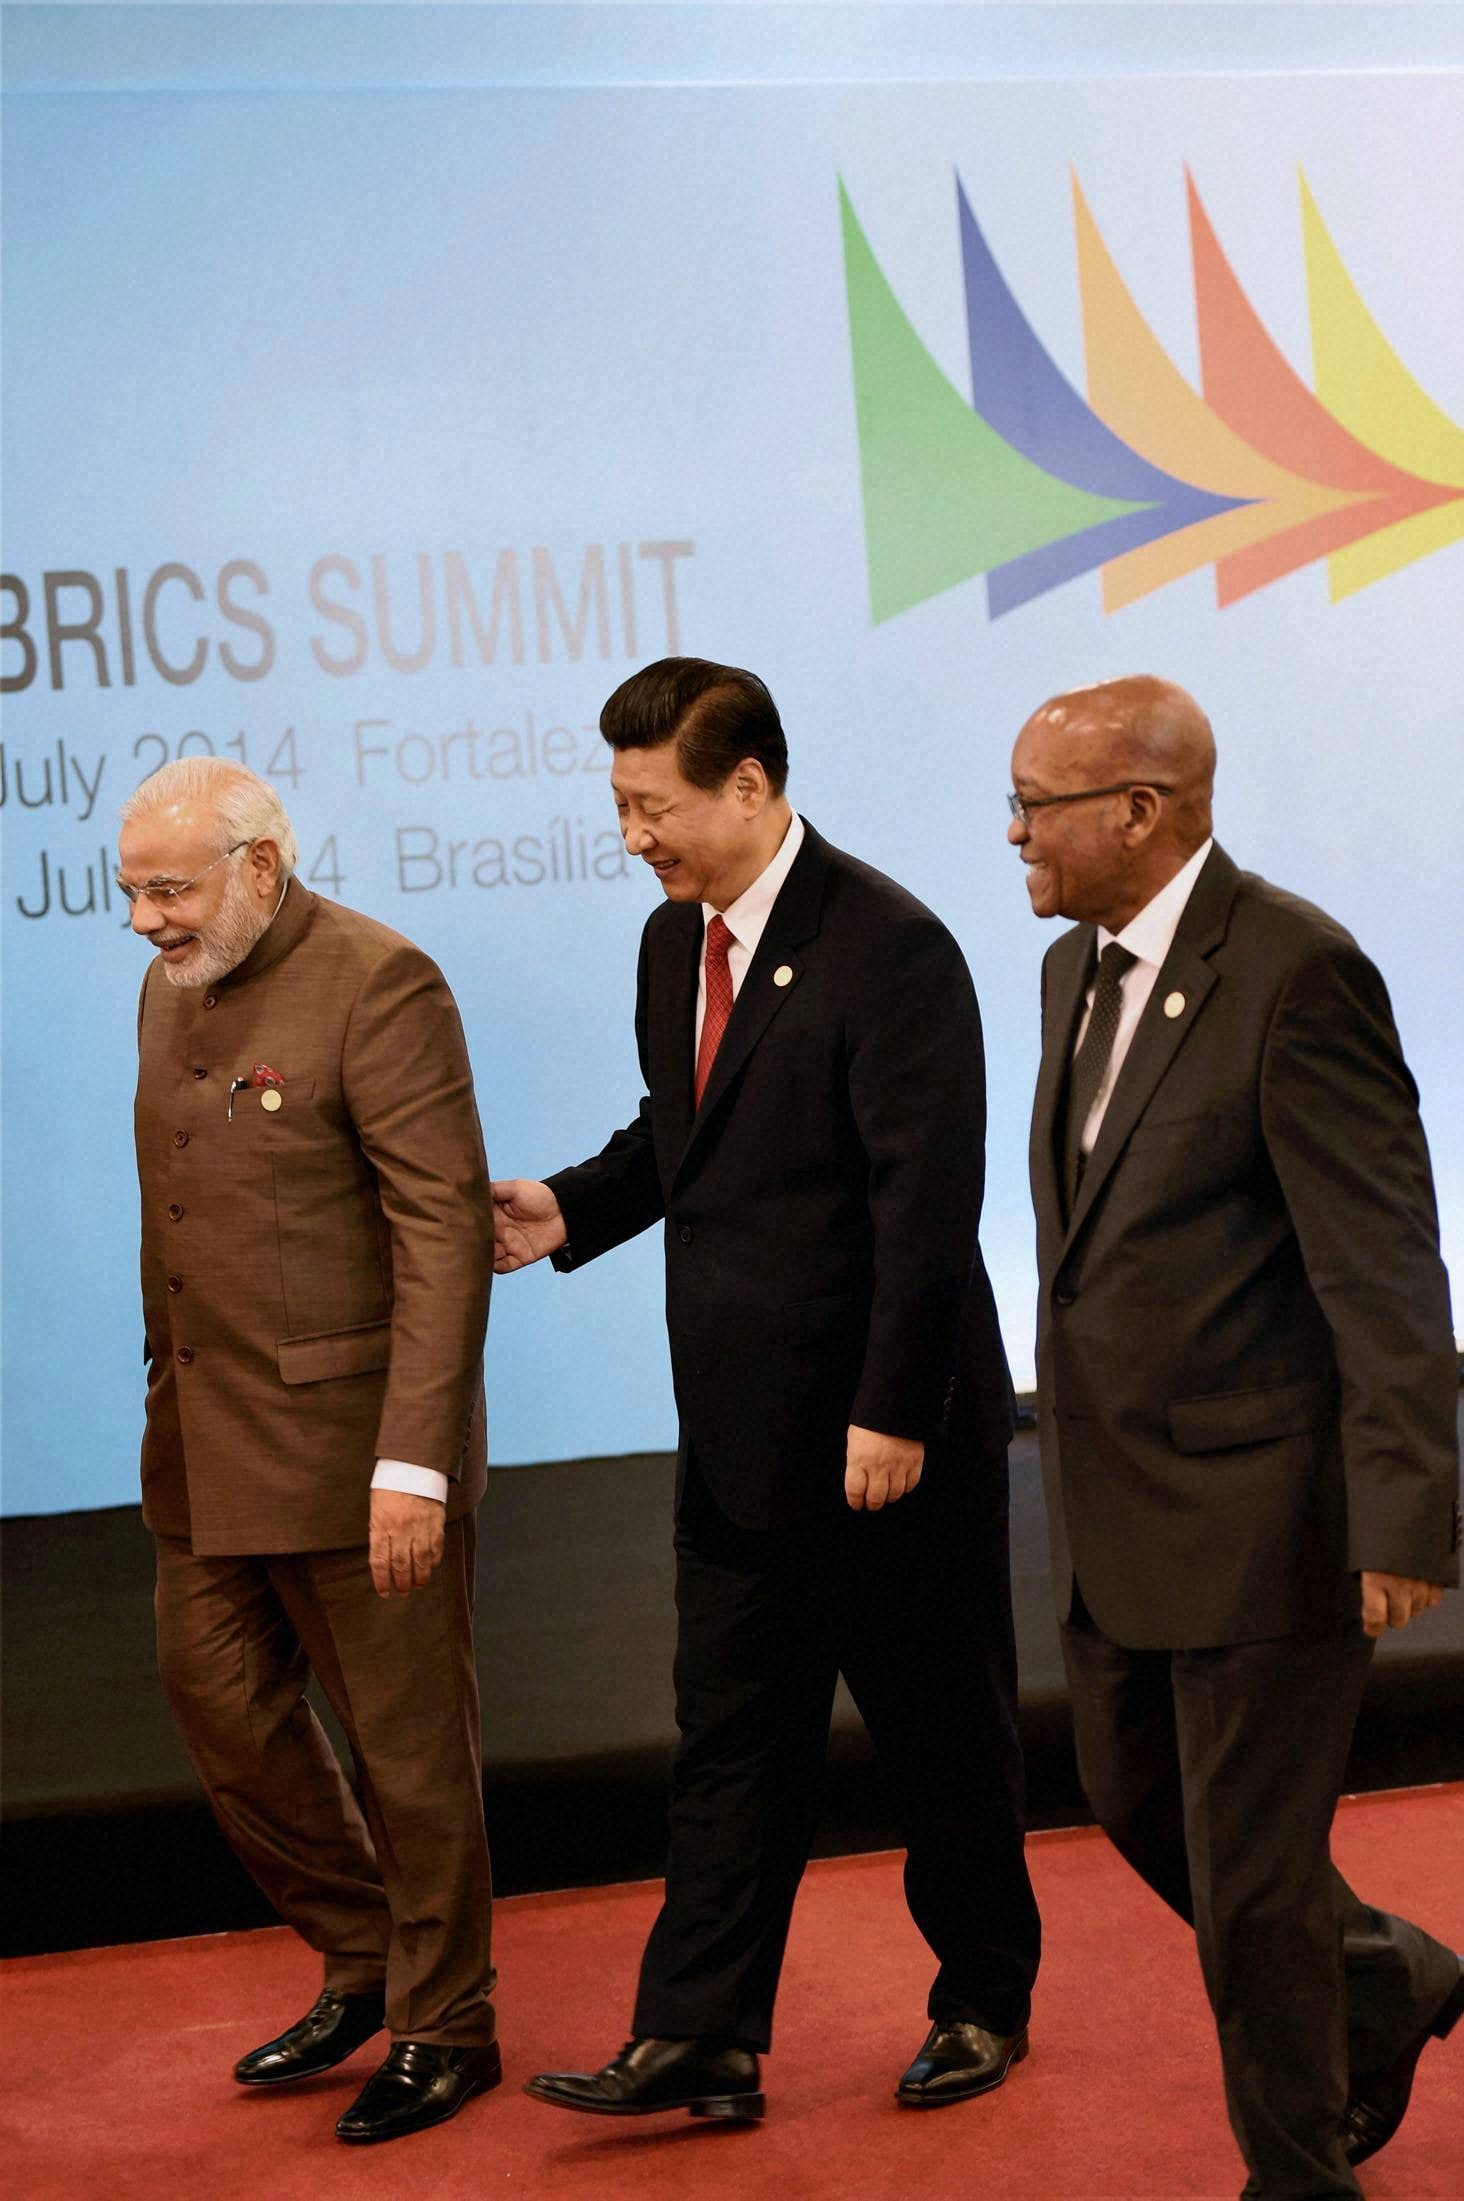 Prime Minister, Narendra Modi, Chinese President, Xi Jinping, South African, President, Jacob Zuma, BRICS Summit, Ceara events, Fortaleza, Brazil